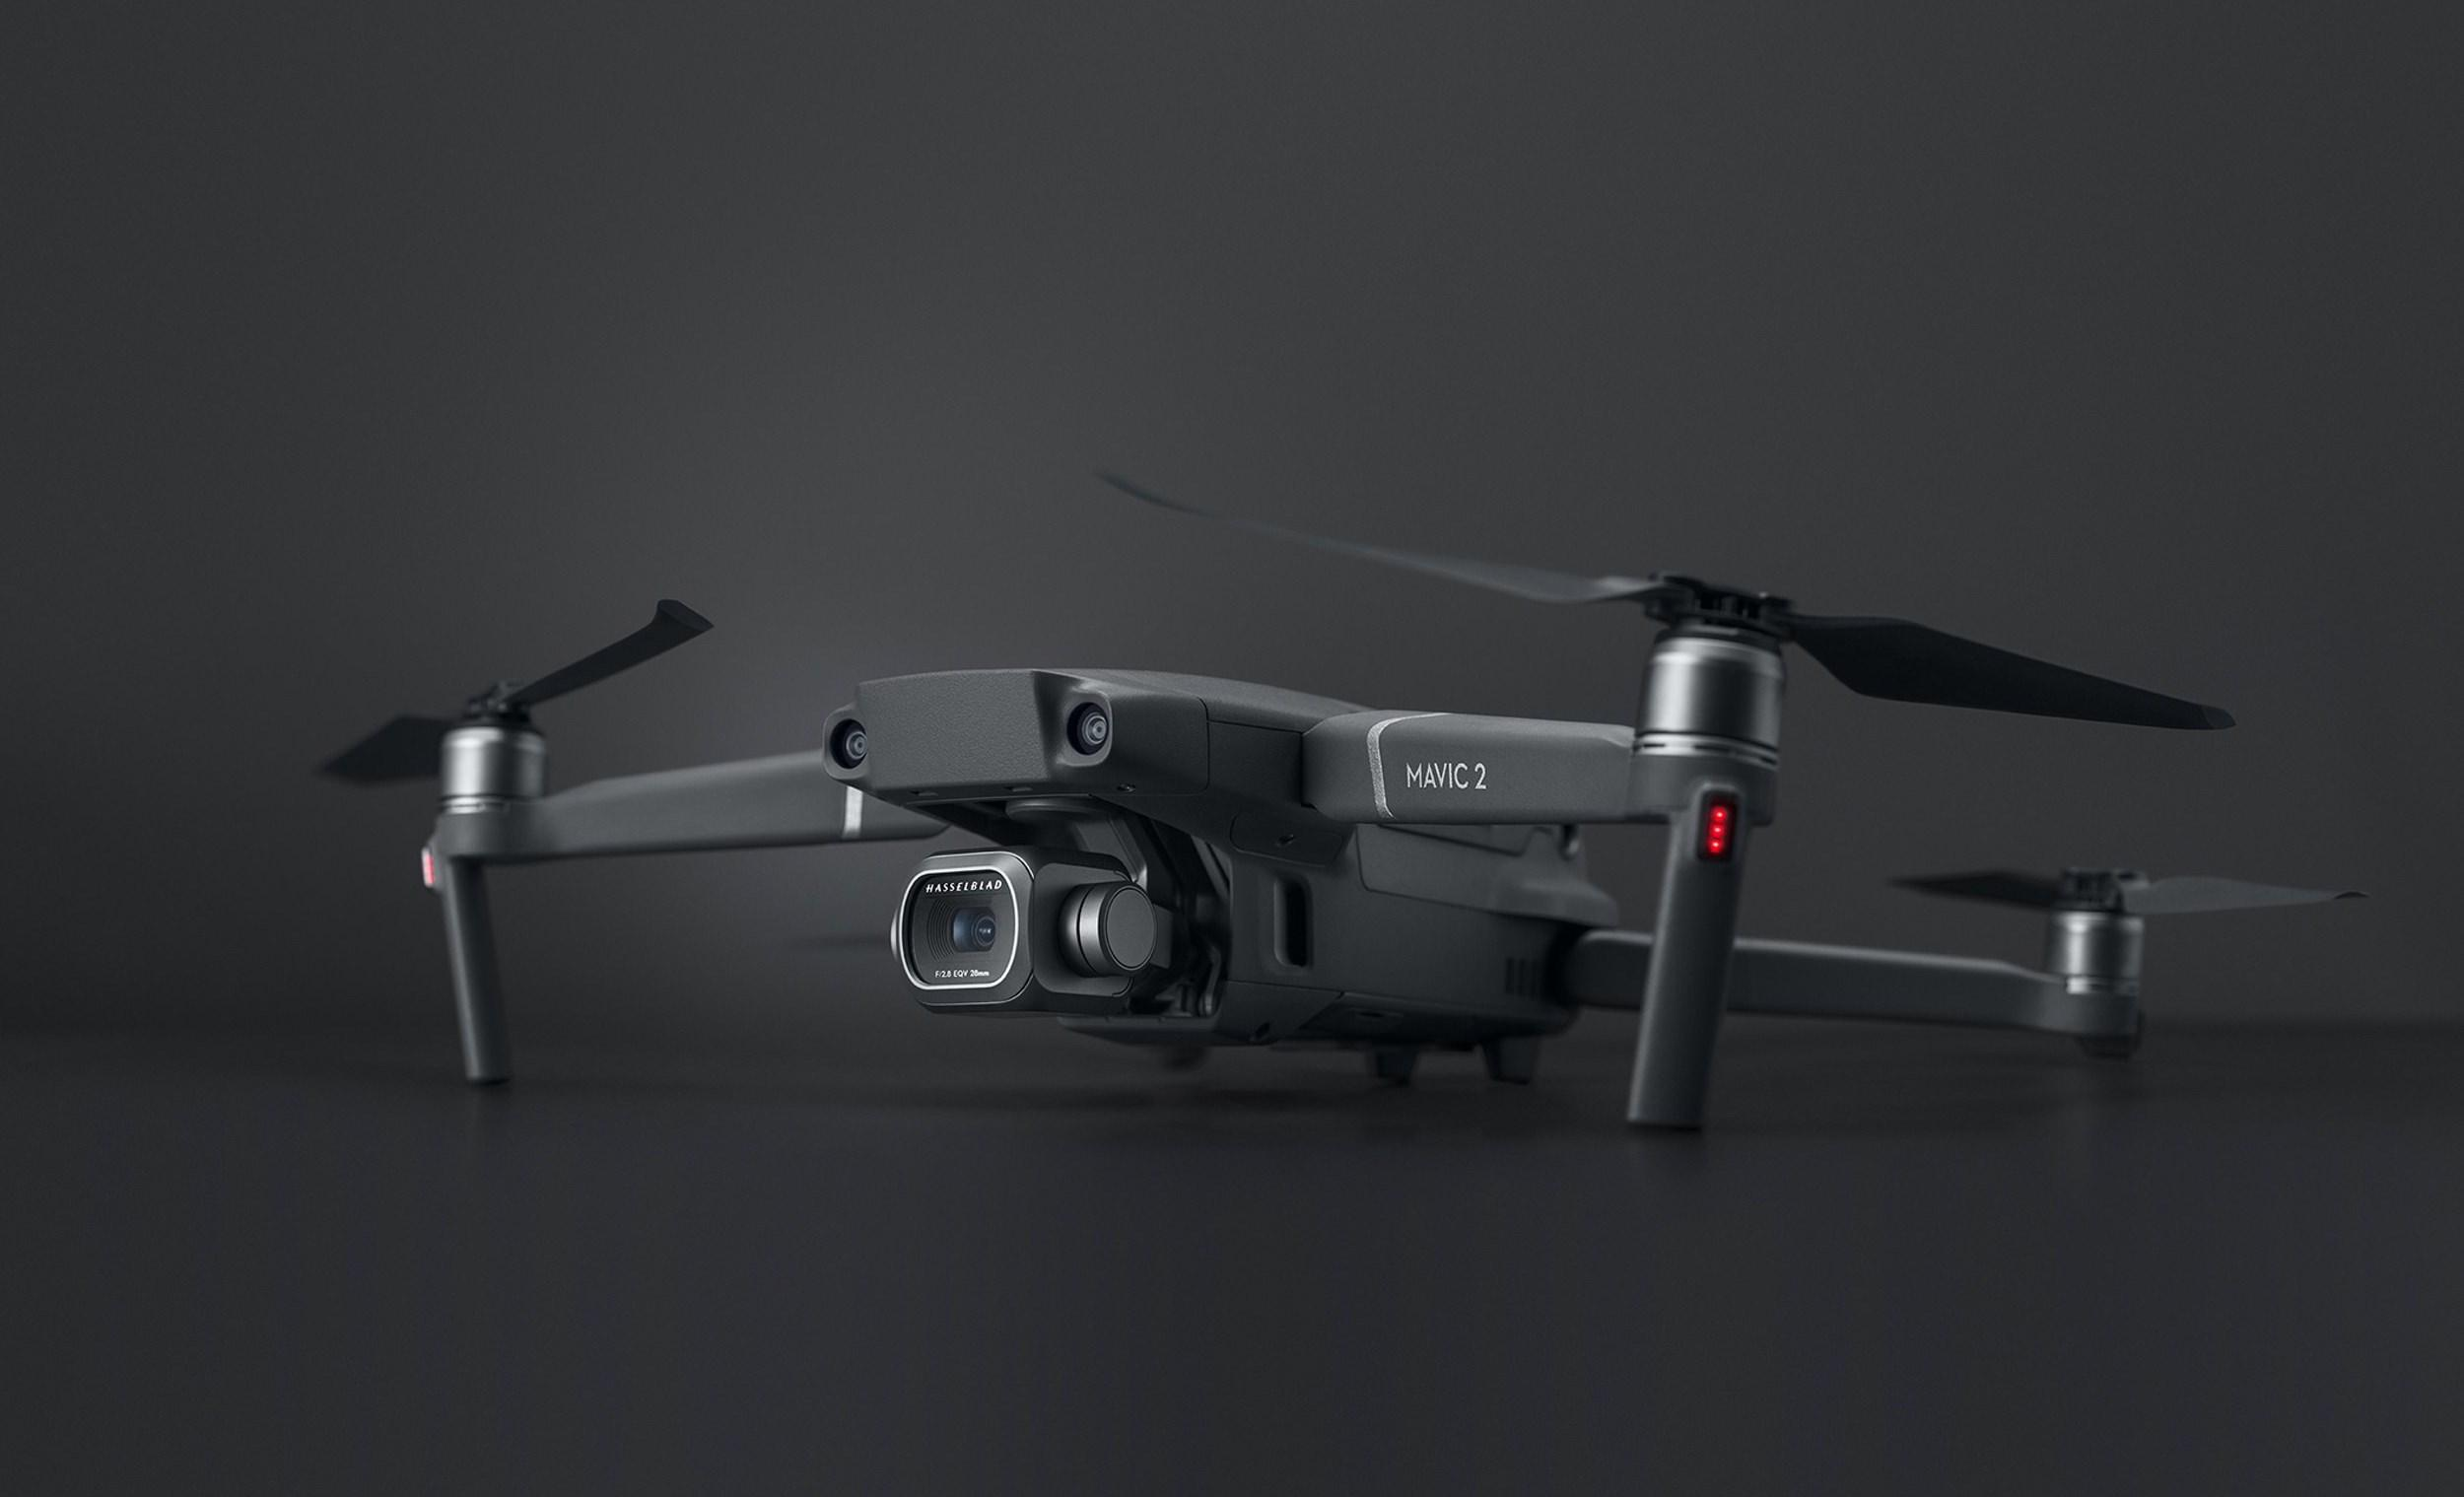 Versichert DJI Mavic 2 Pro Drohne günstig in Berlin mieten